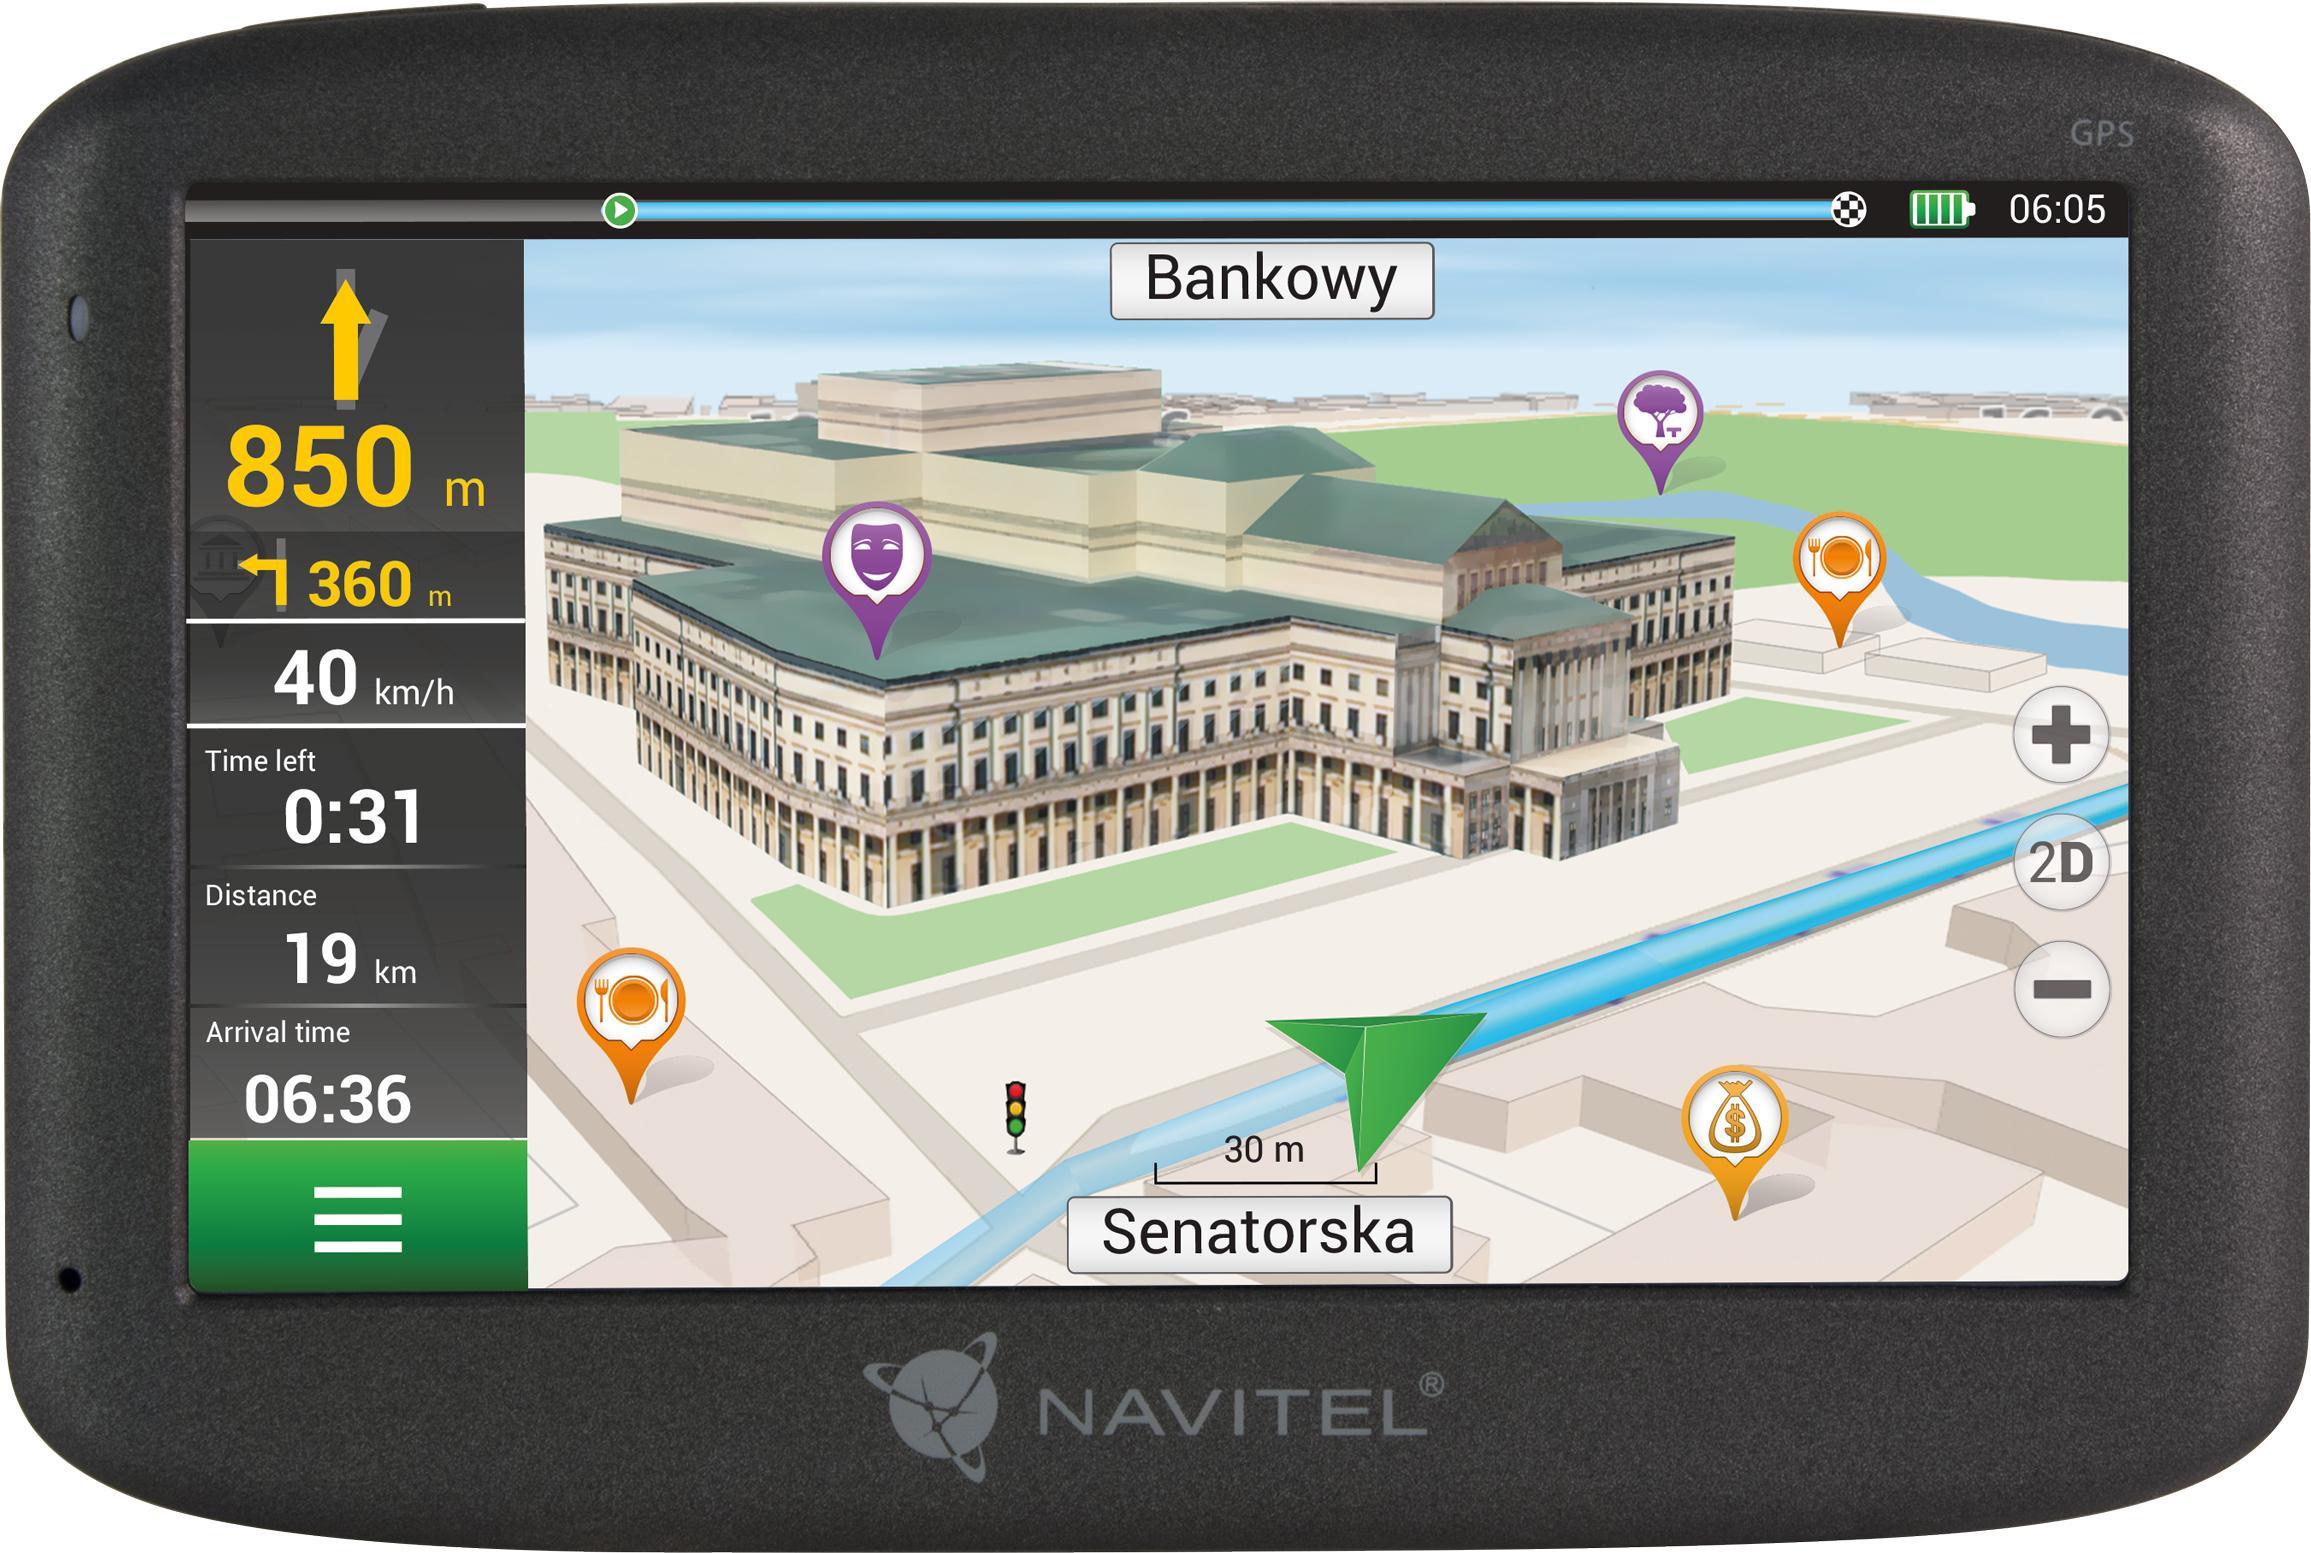 NAVMS400 NAVITEL Wi-Fi: Nein, Windows CE 6.0 Navigationssystem NAVMS400 günstig kaufen